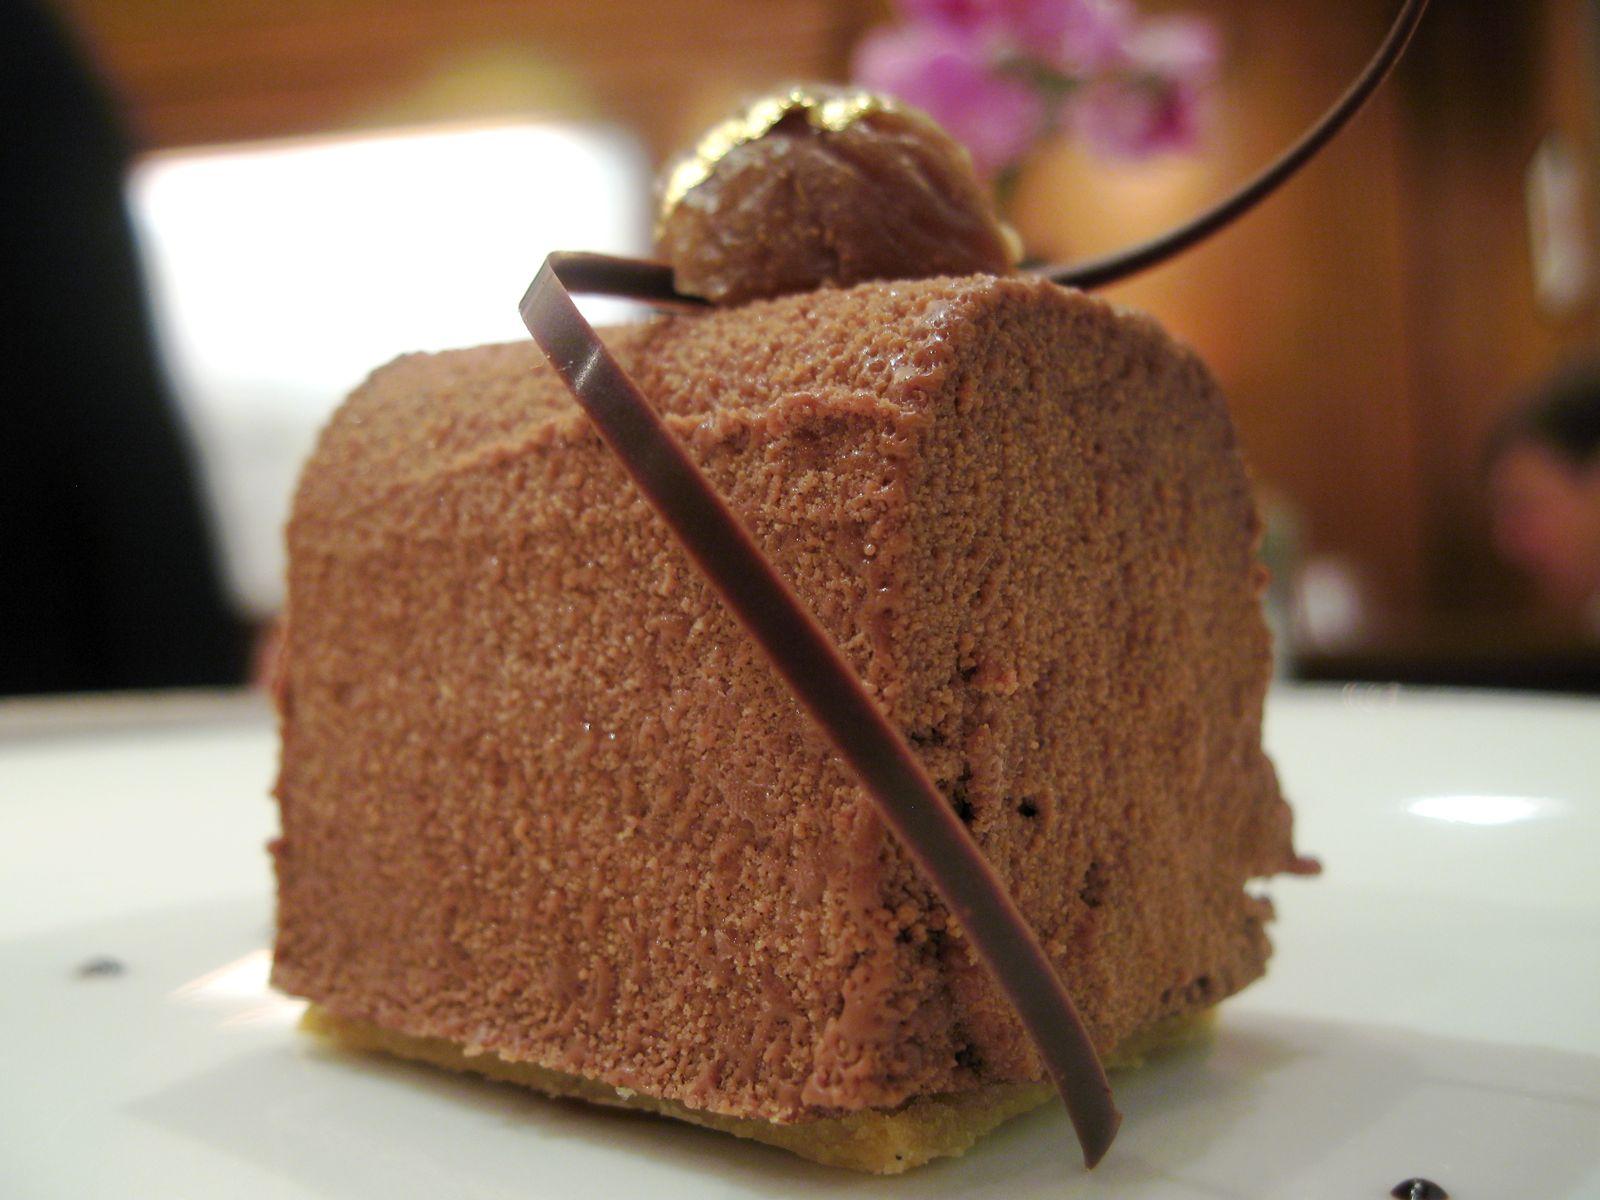 Craquant au chocolat et aux marron